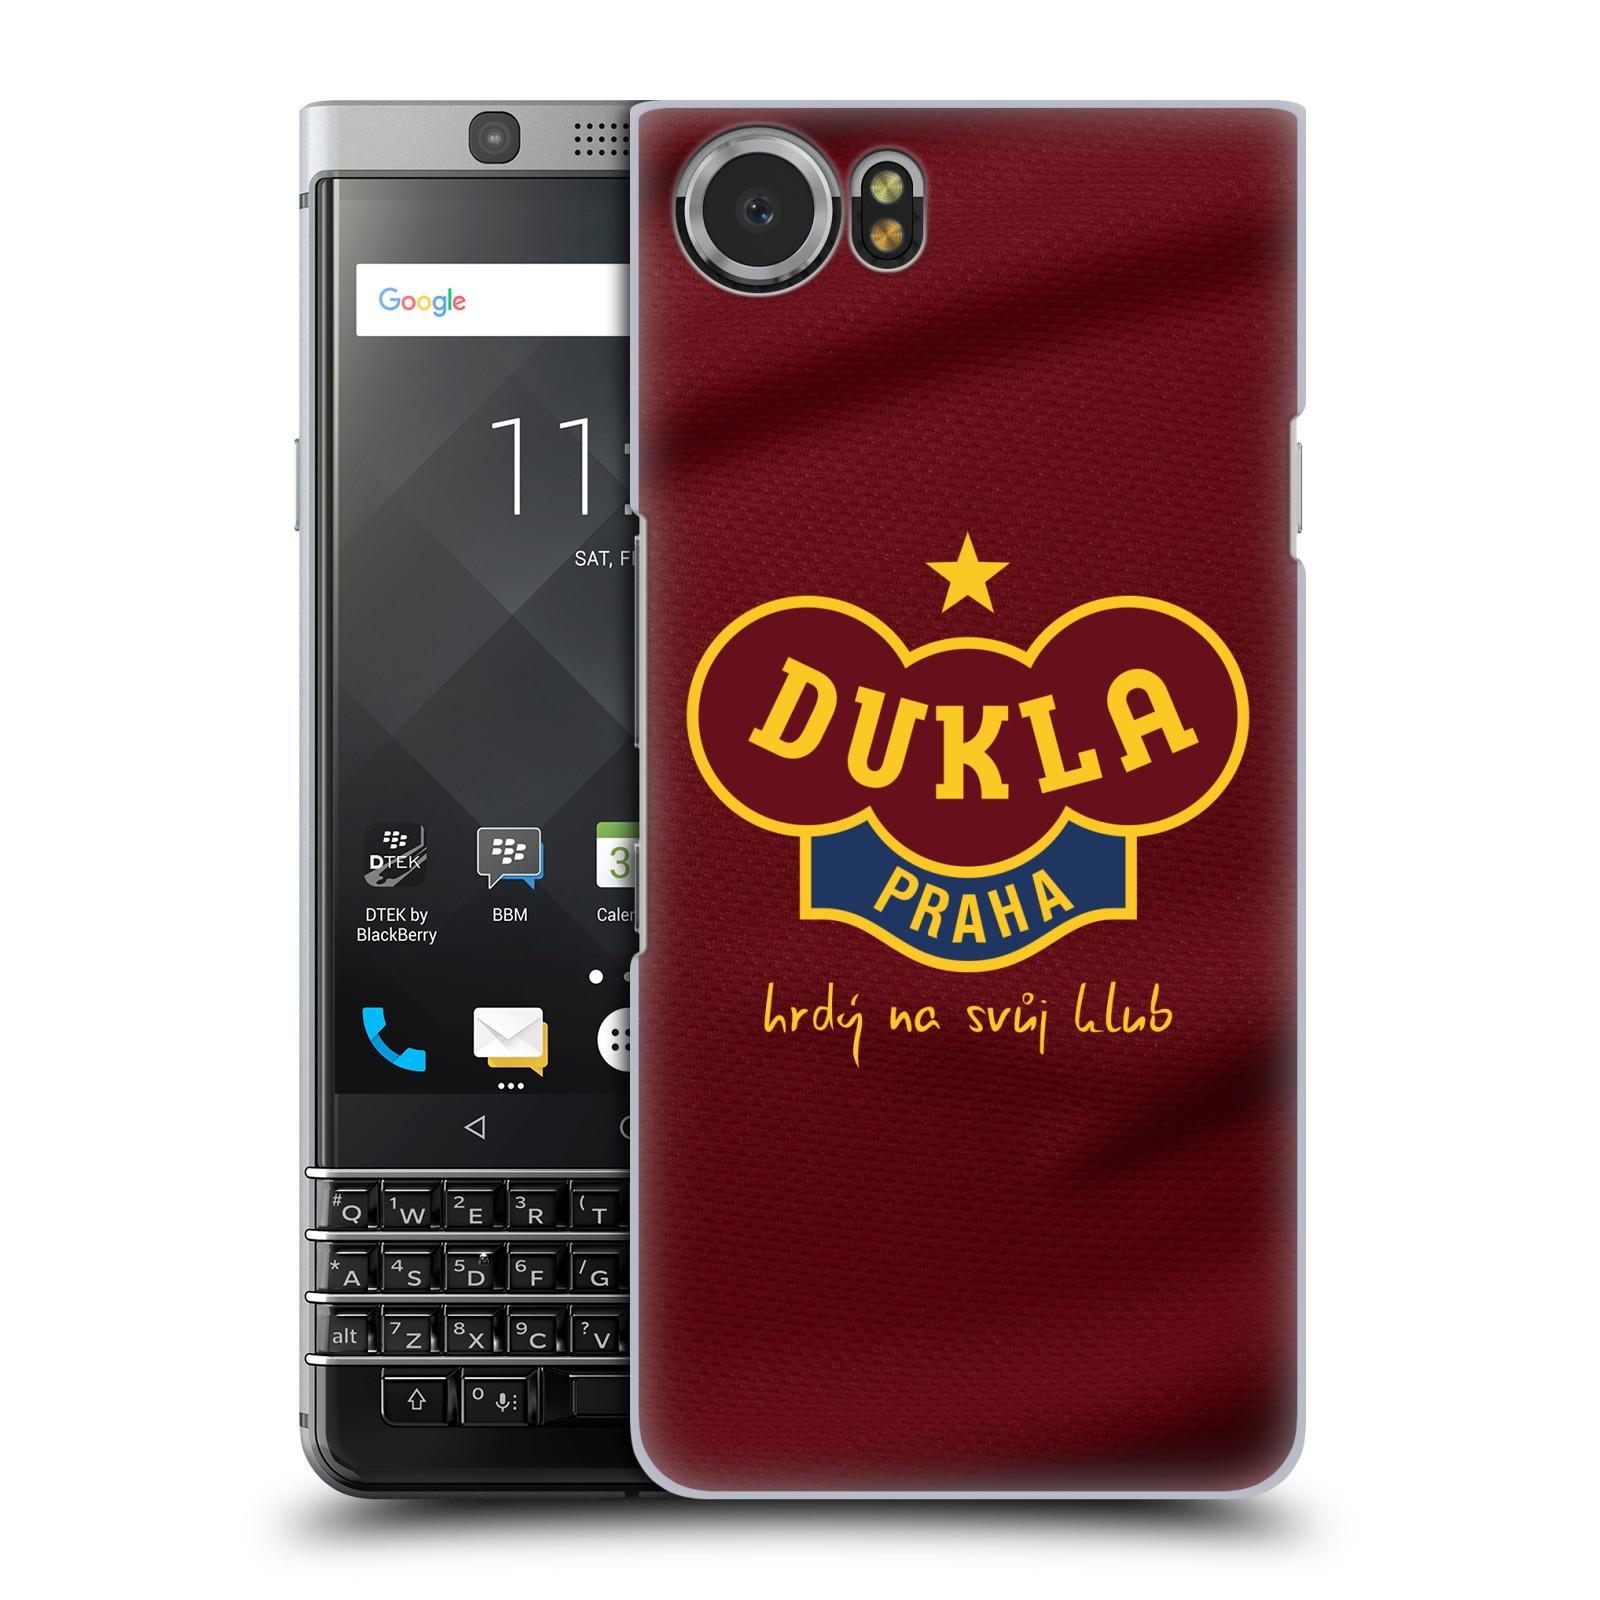 Plastové pouzdro na mobil BlackBerry KEYone - FK Dukla Praha - Vínově červený dres (Plastové pouzdro na mobil BlackBerry KEYone - FK Dukla Praha - Vínově červený dres)